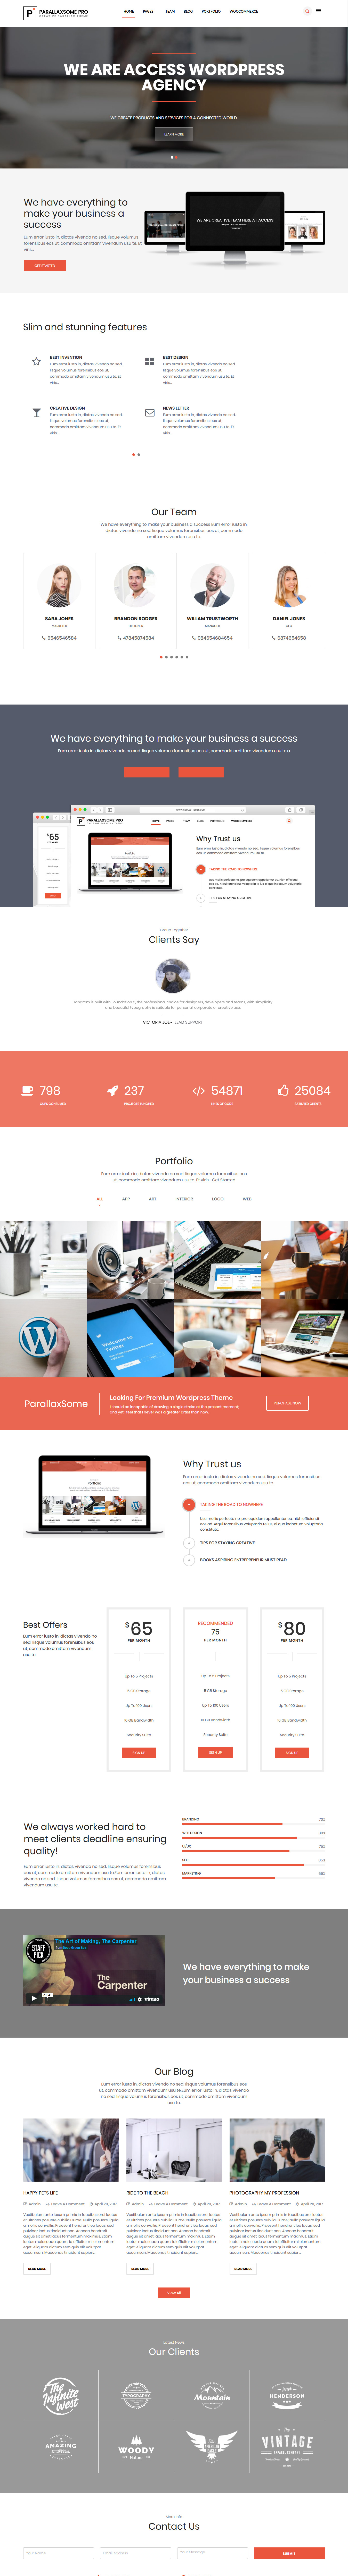 parallaxsome best premium parallax wordpress themes - 10+ Best Premium Parallax WordPress Themes and Templates